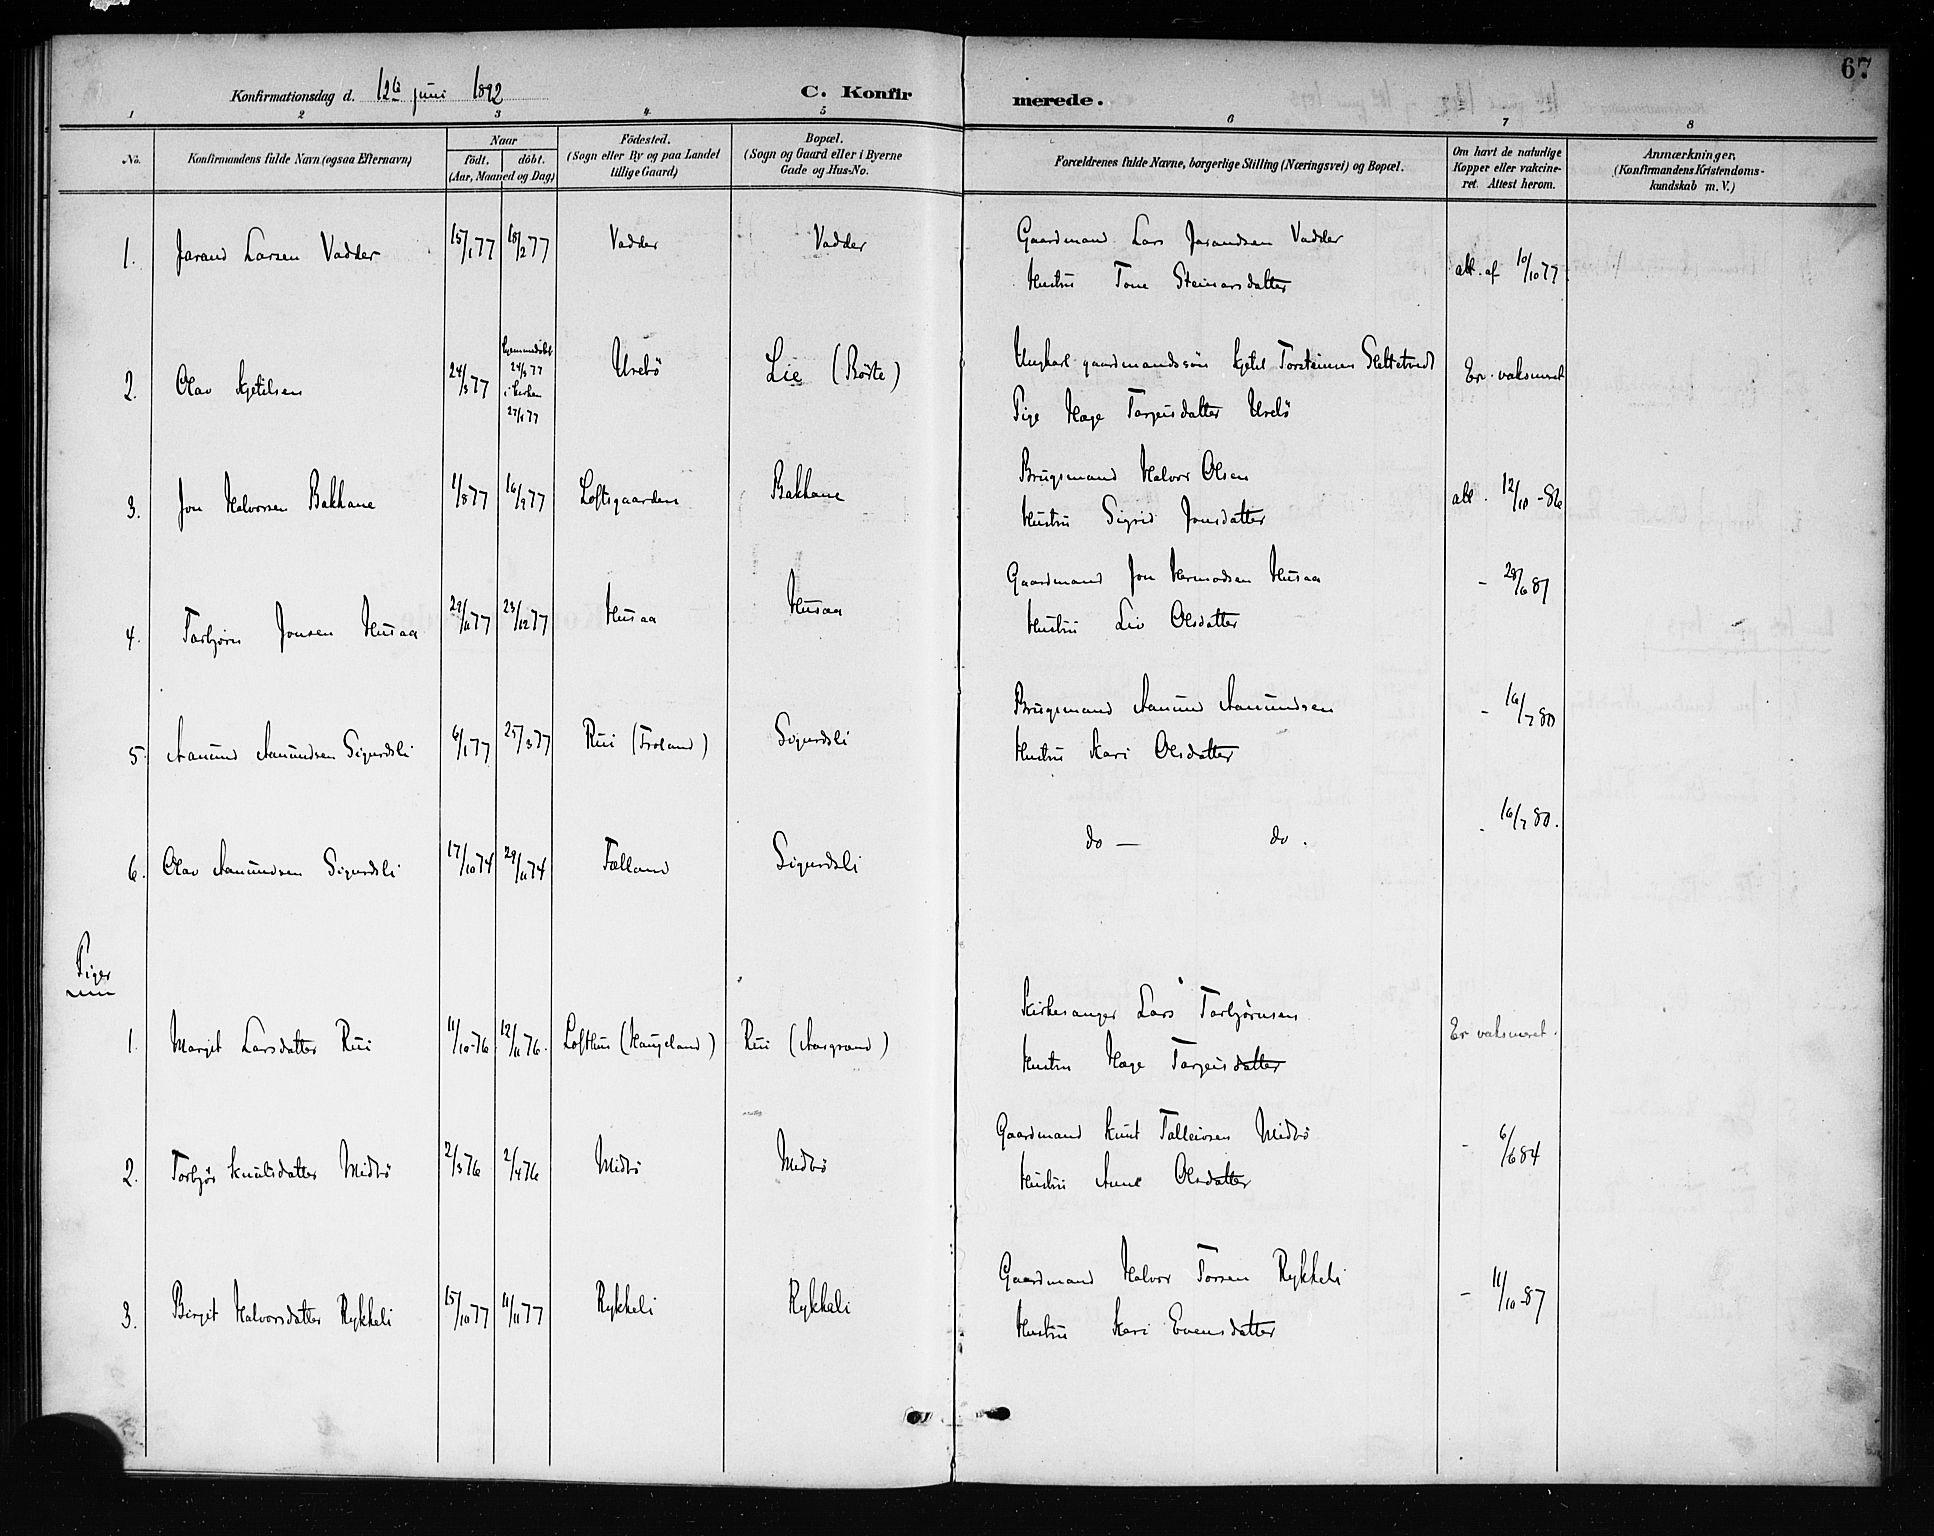 SAKO, Mo kirkebøker, G/Ga/L0002: Klokkerbok nr. I 2, 1892-1914, s. 67